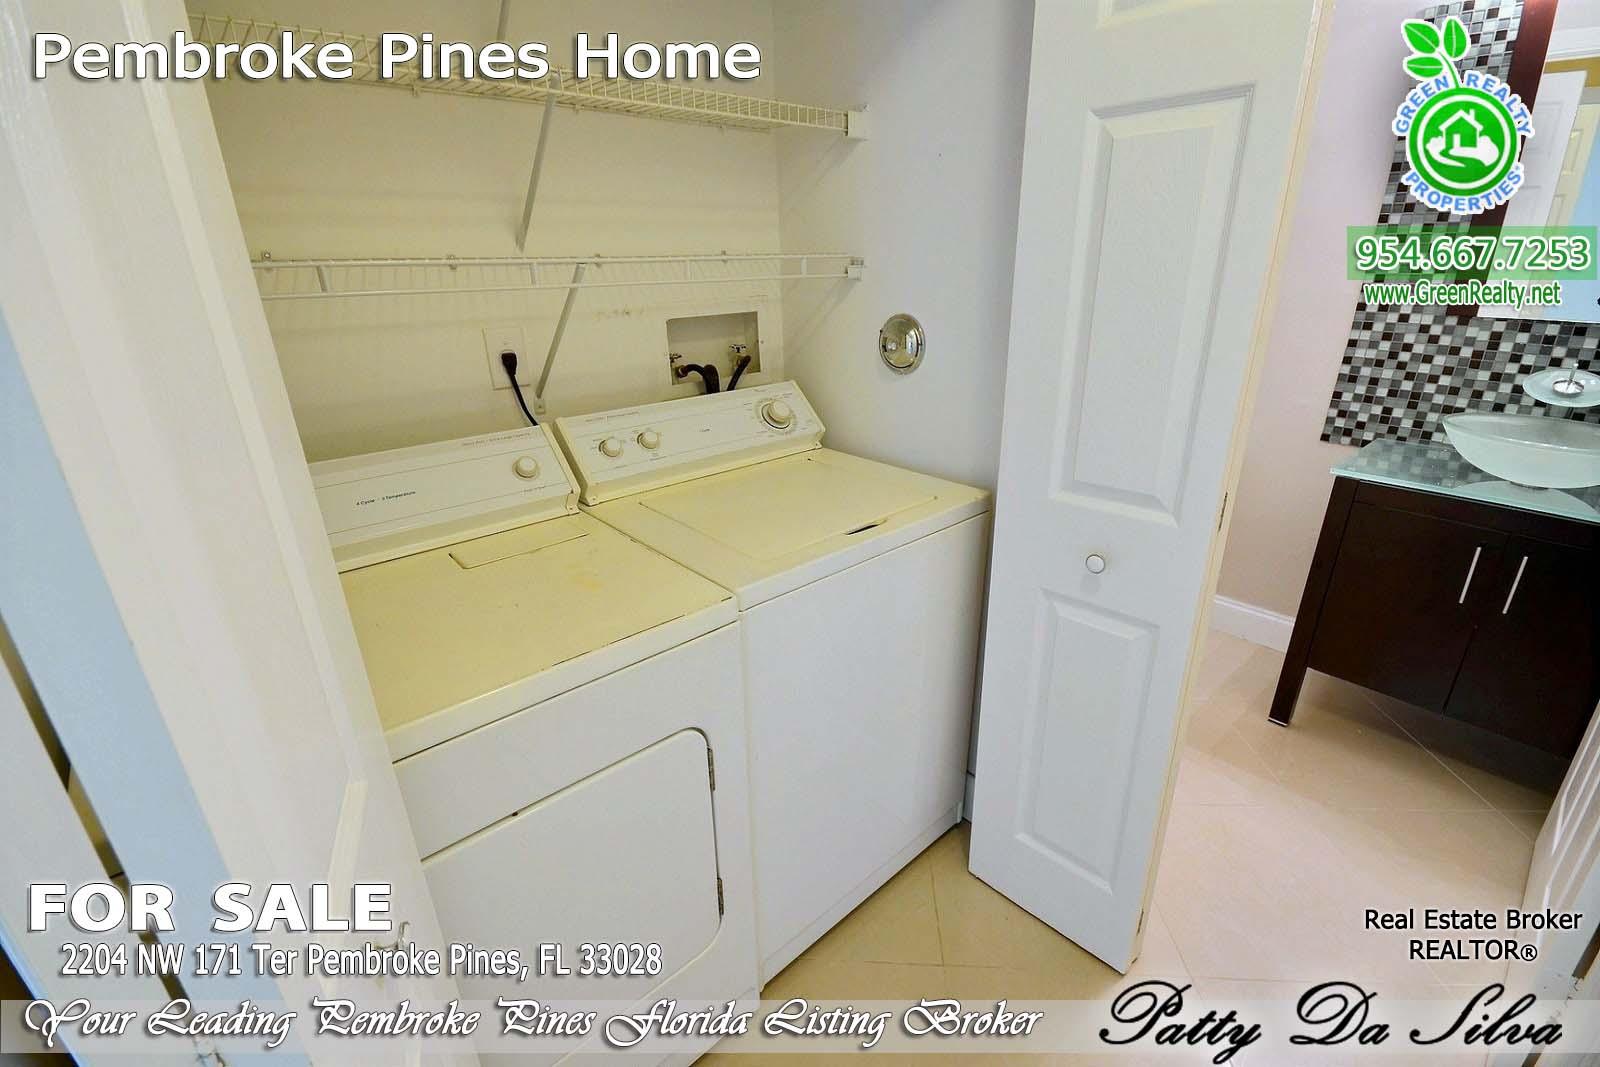 Pembroke Pines Homes For Sale - Pembroke Isles (7)